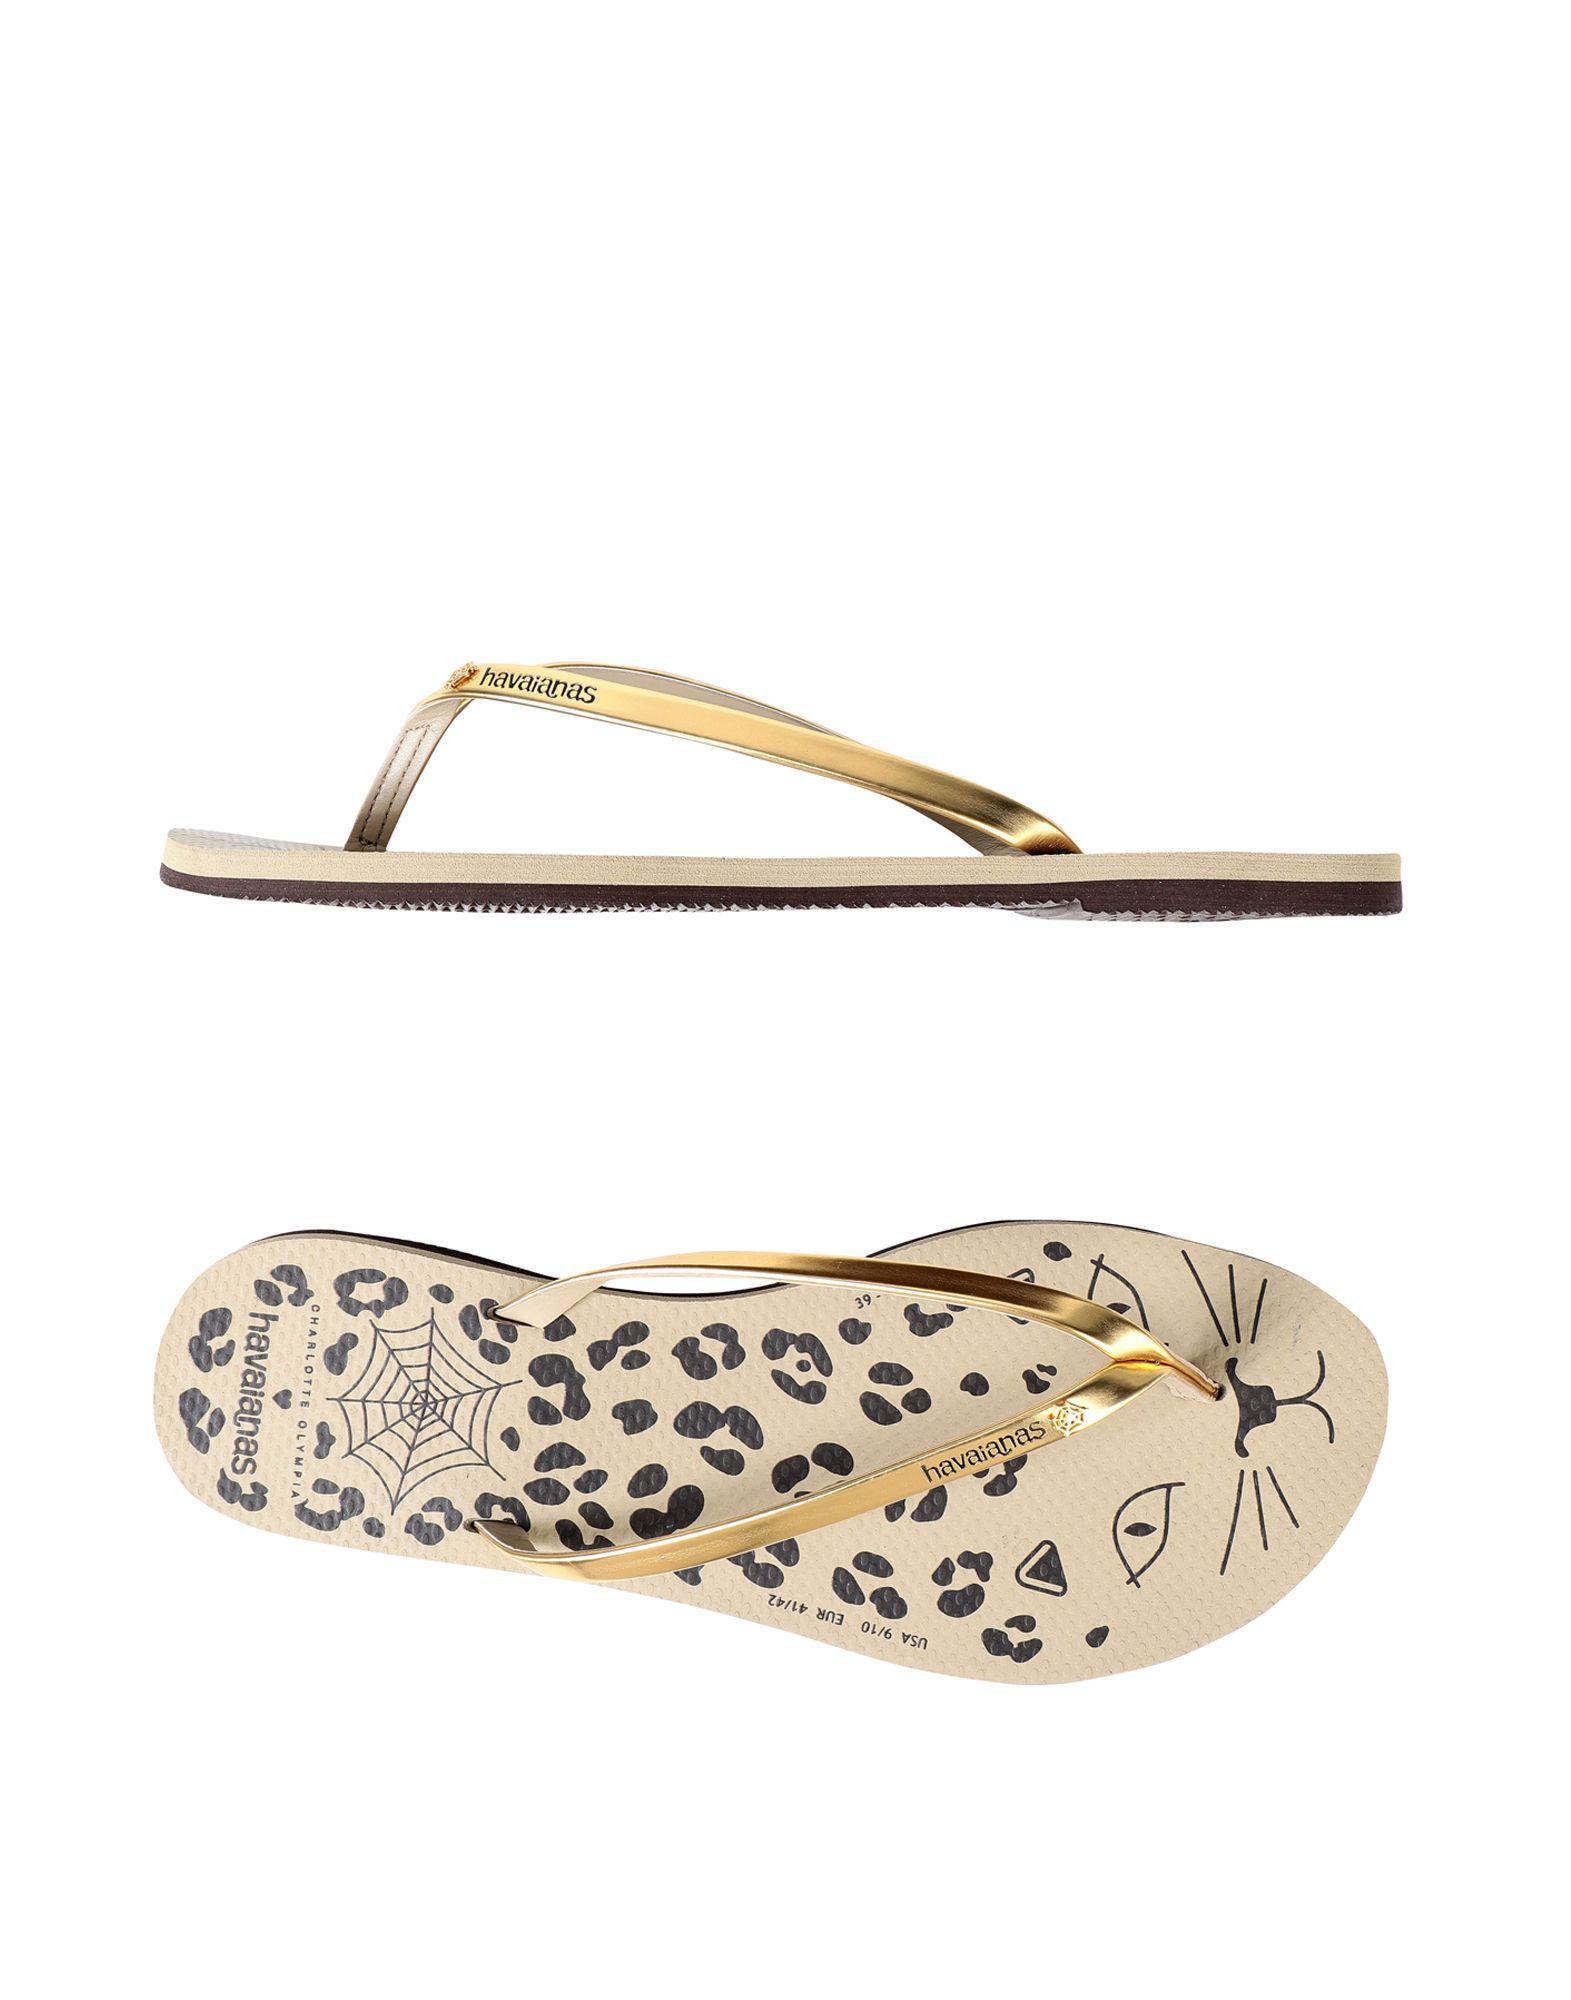 Charlotte Olympia  Loves Havaianas Dianetten Damen  Olympia 11524358XK Gute Qualität beliebte Schuhe 997bf2